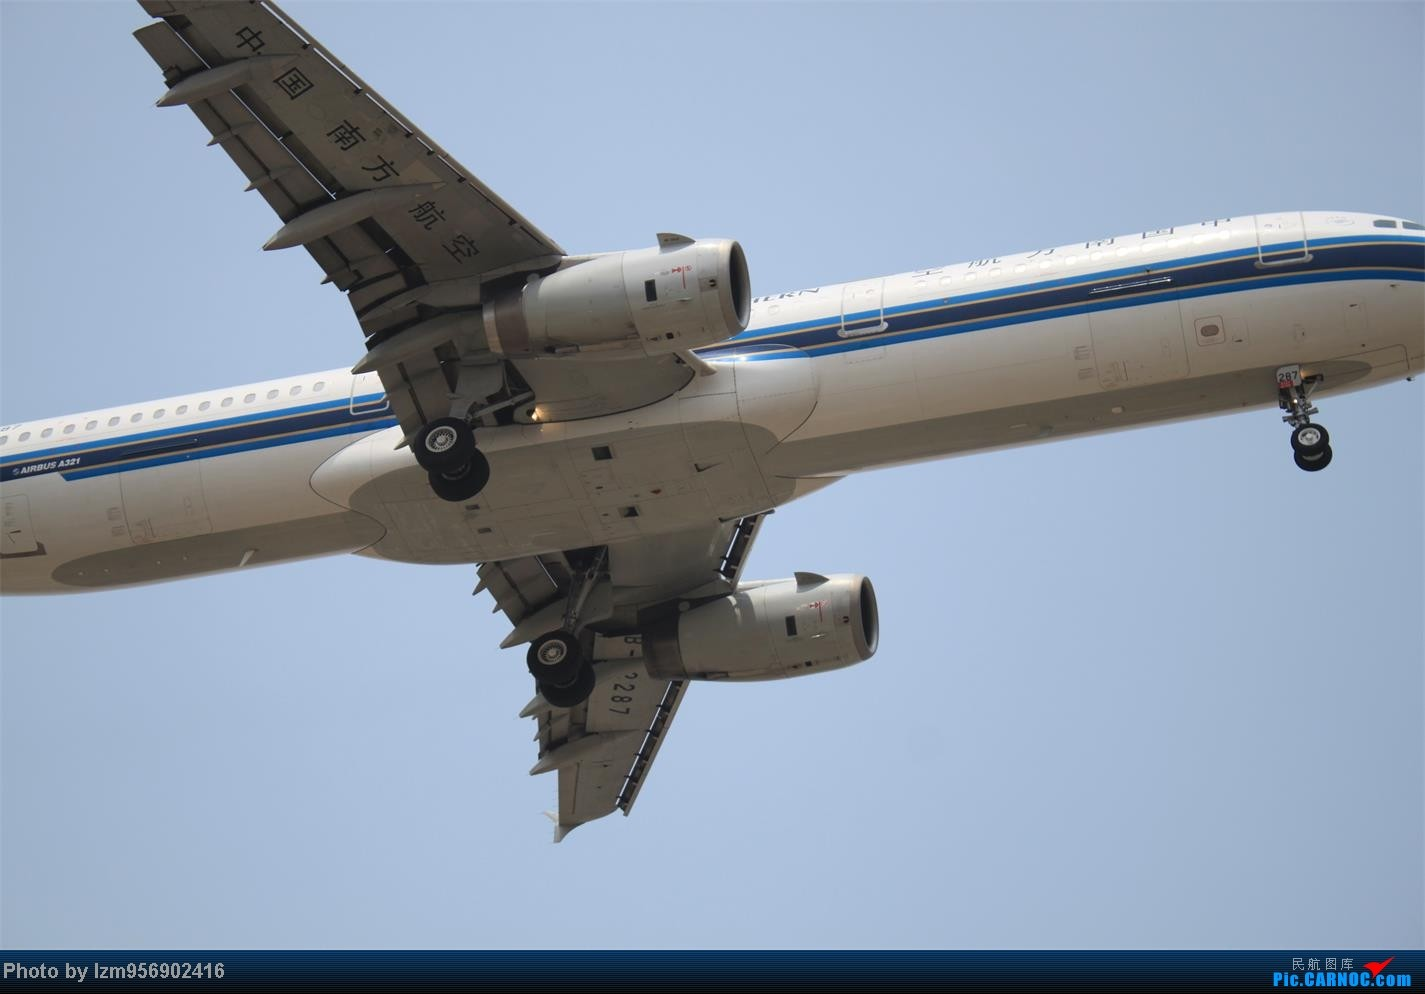 Re:[原创]DLC蹲点大半天,拍到了大棒航空772=w= AIRBUS A321-200 B-2287 中国大连周水子机场